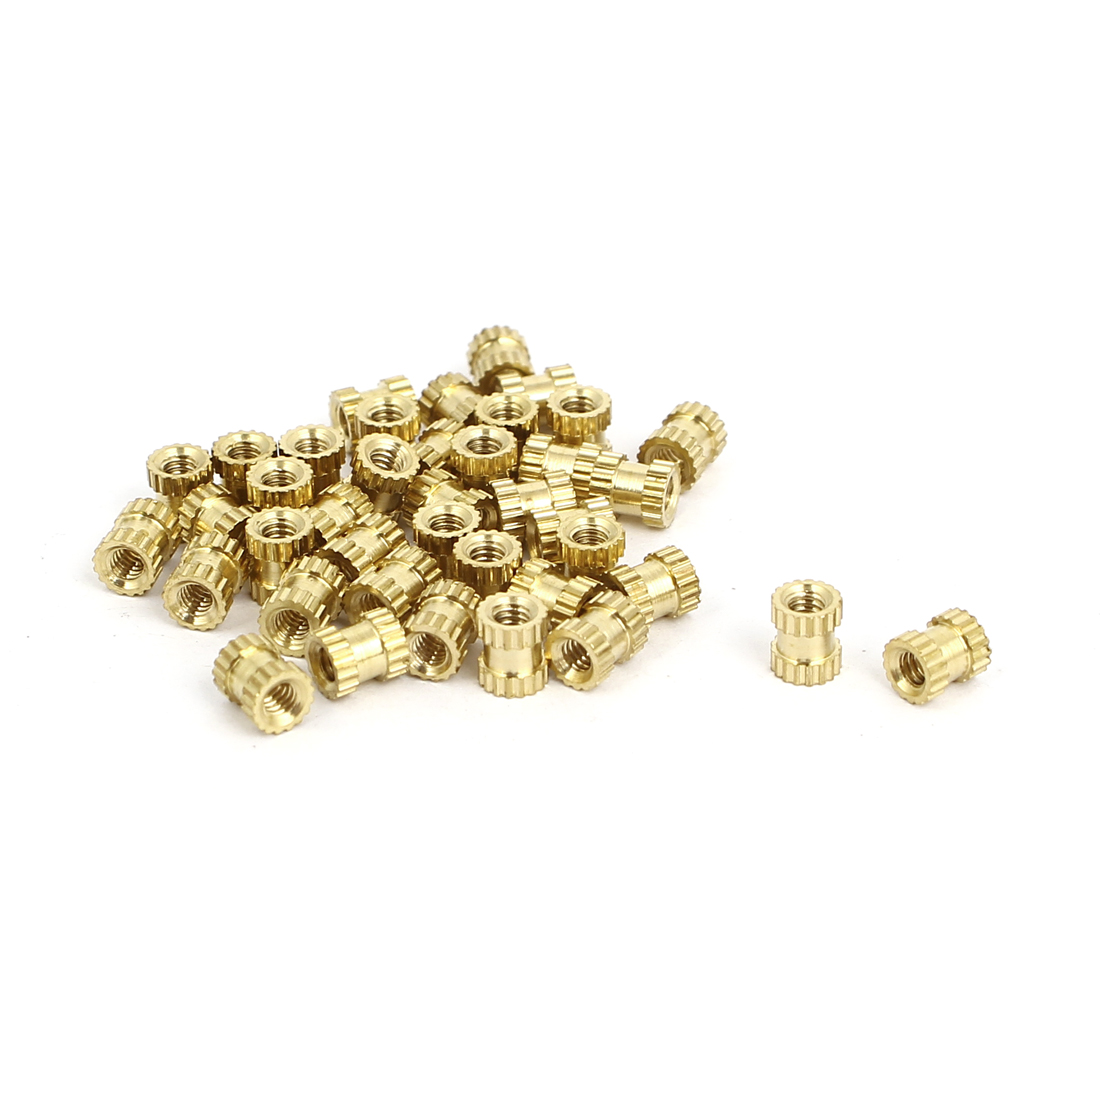 M2x4mmx3.5mm Brass Knurled Threaded Nut Insert Embedded Nuts Gold Tone 40pcs